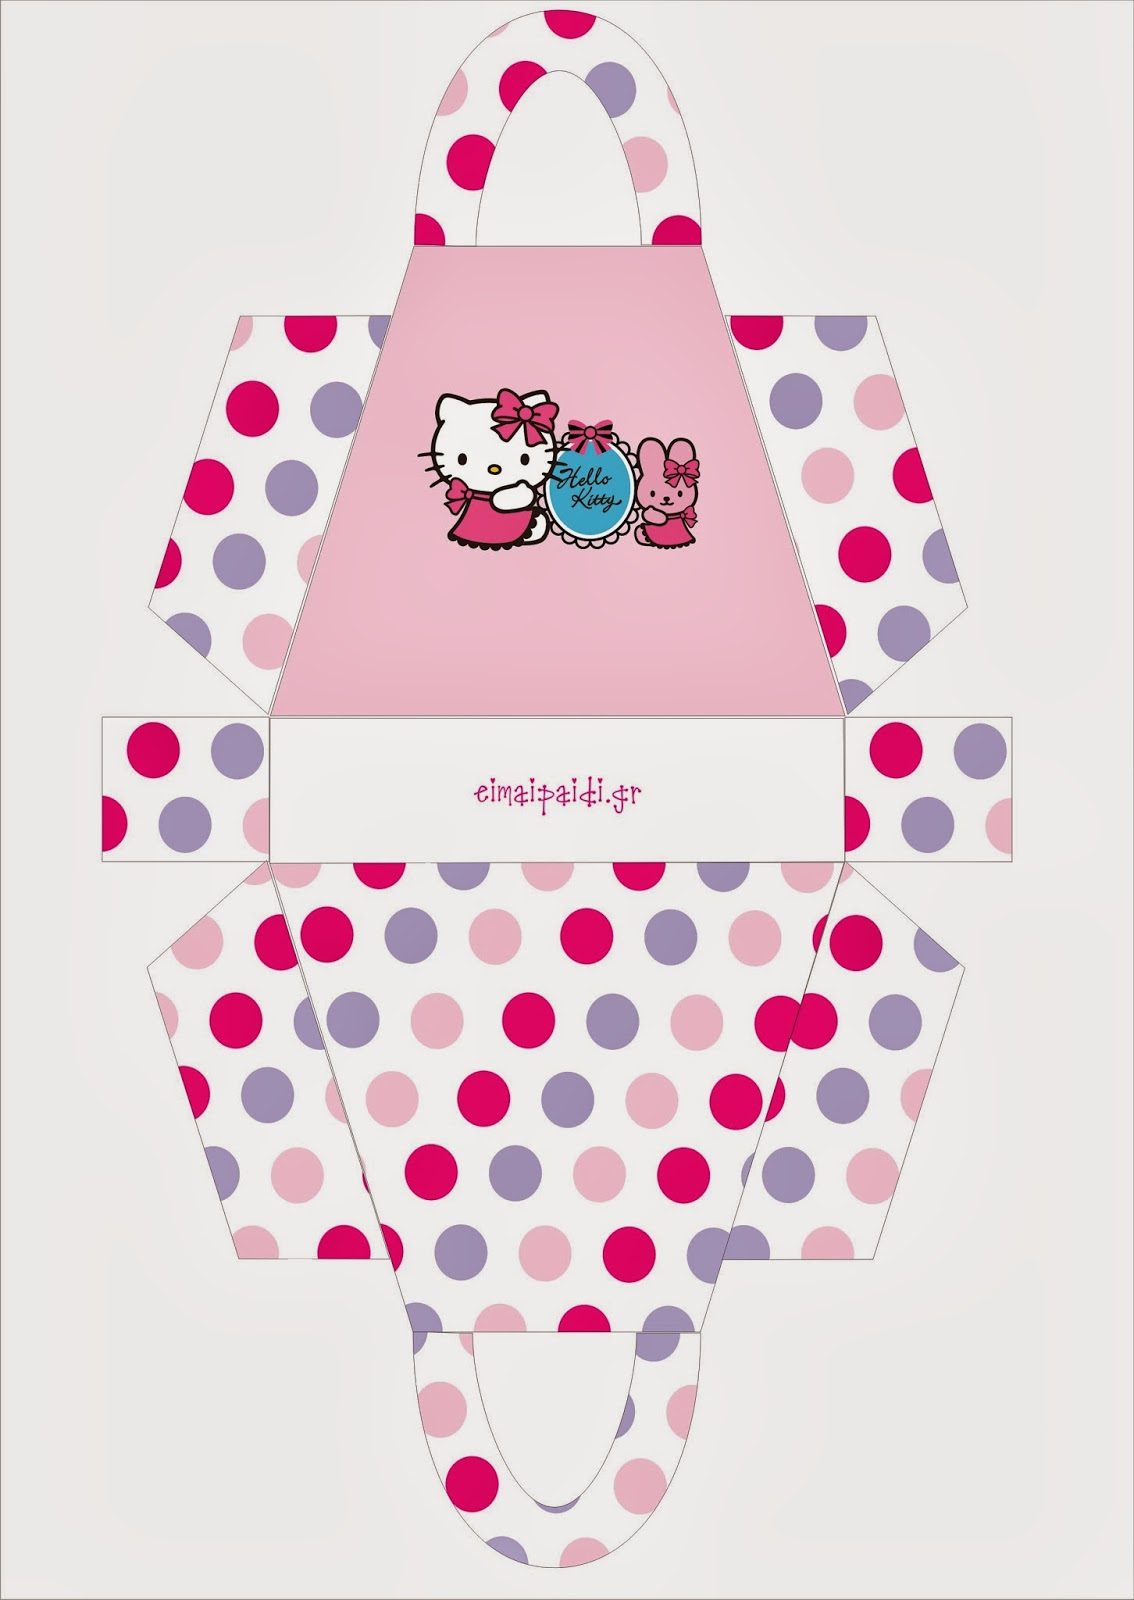 eimaipaidi.gr-τσαντάκι Hello Kitty-printables